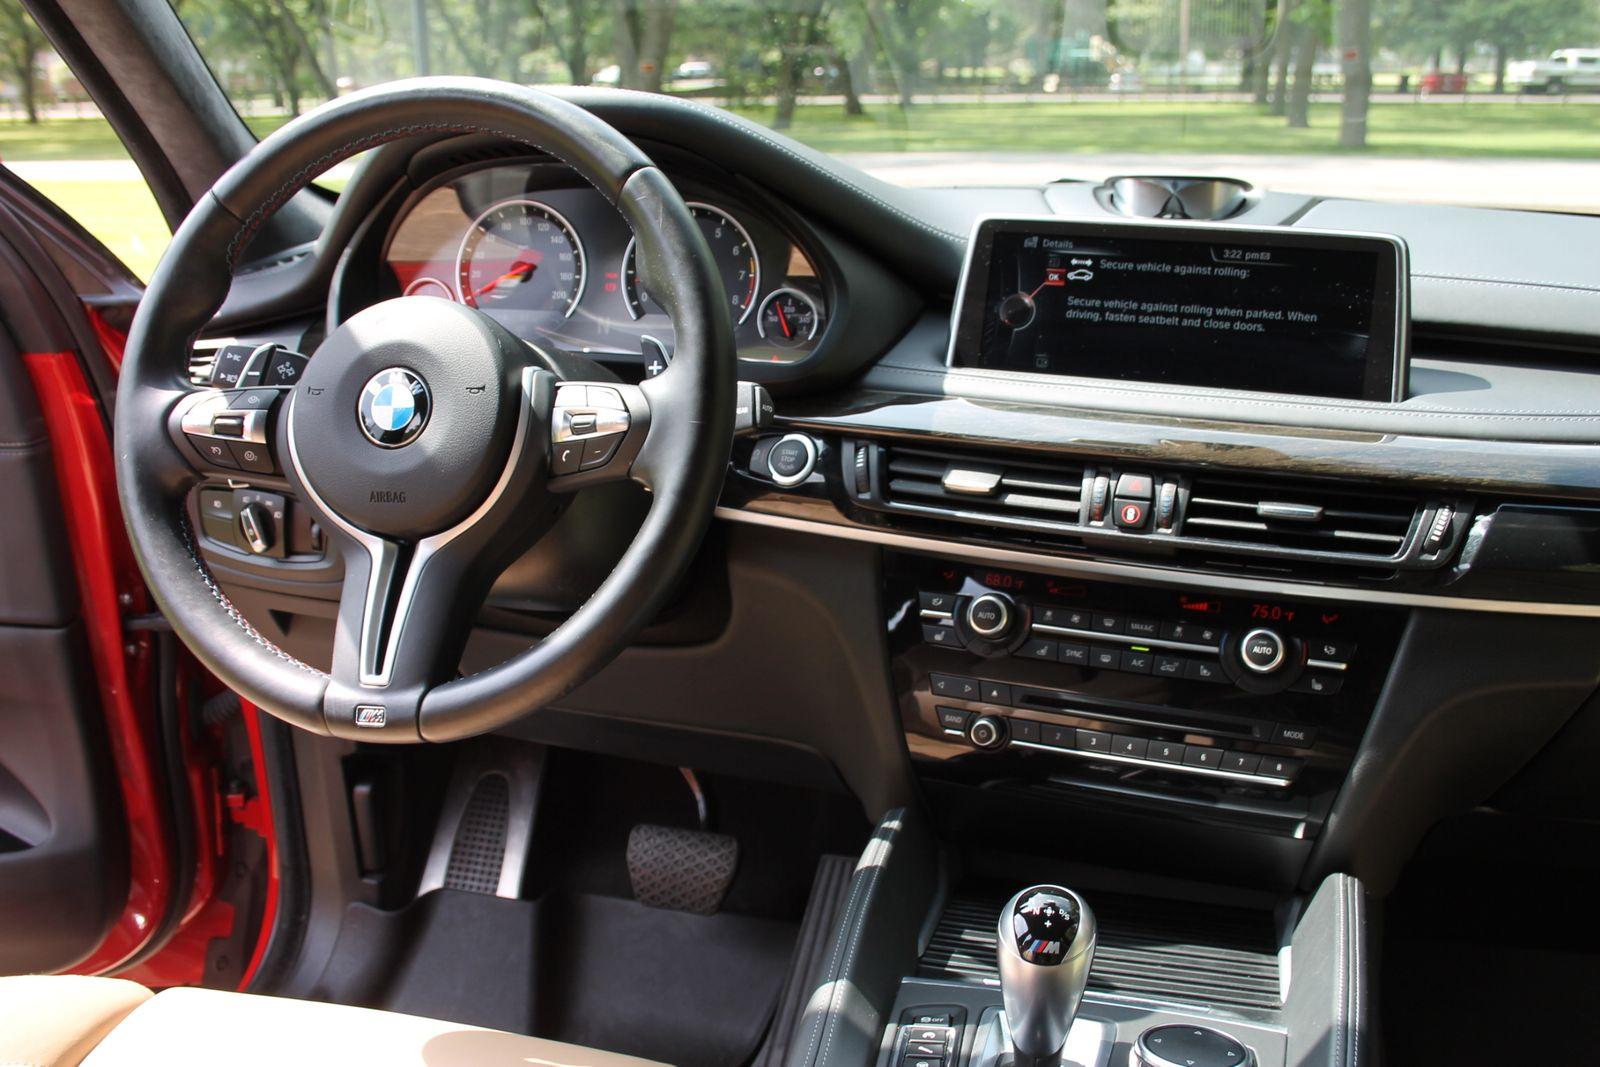 2015 Bmw X5 M Price Used Cars Memphis Hallum Motors